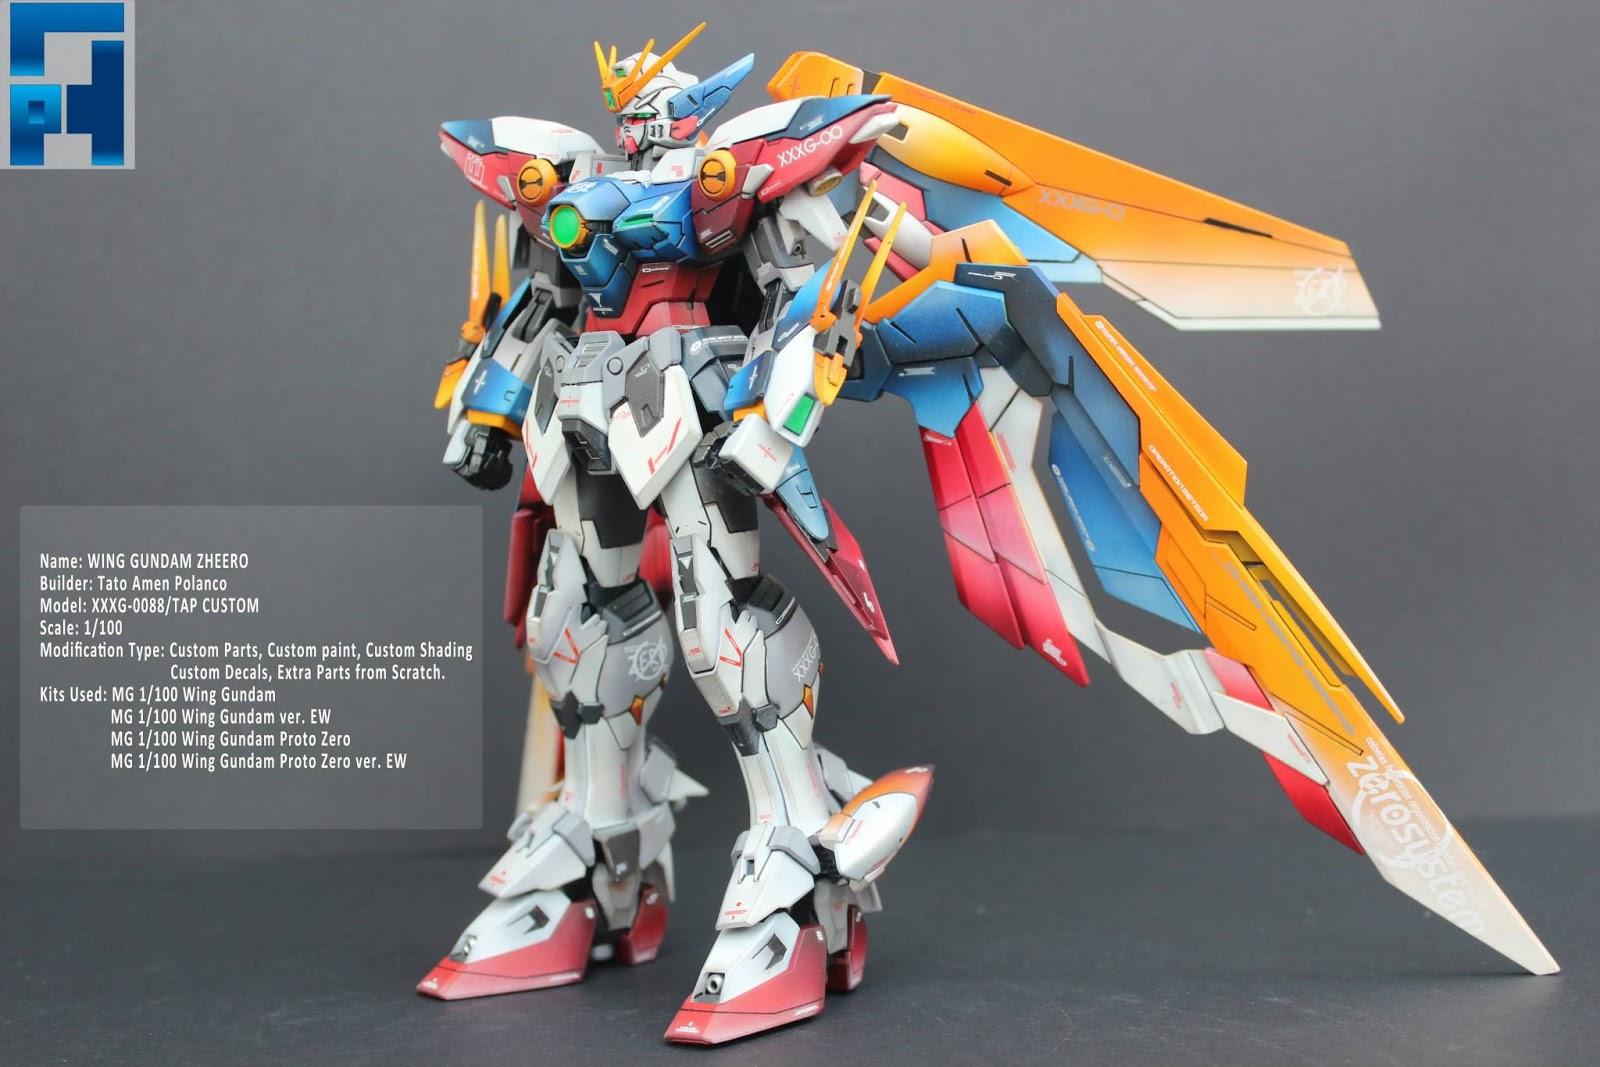 Bandai Hobby MG Wing Gundam Proto Zero Version EW Model Kit